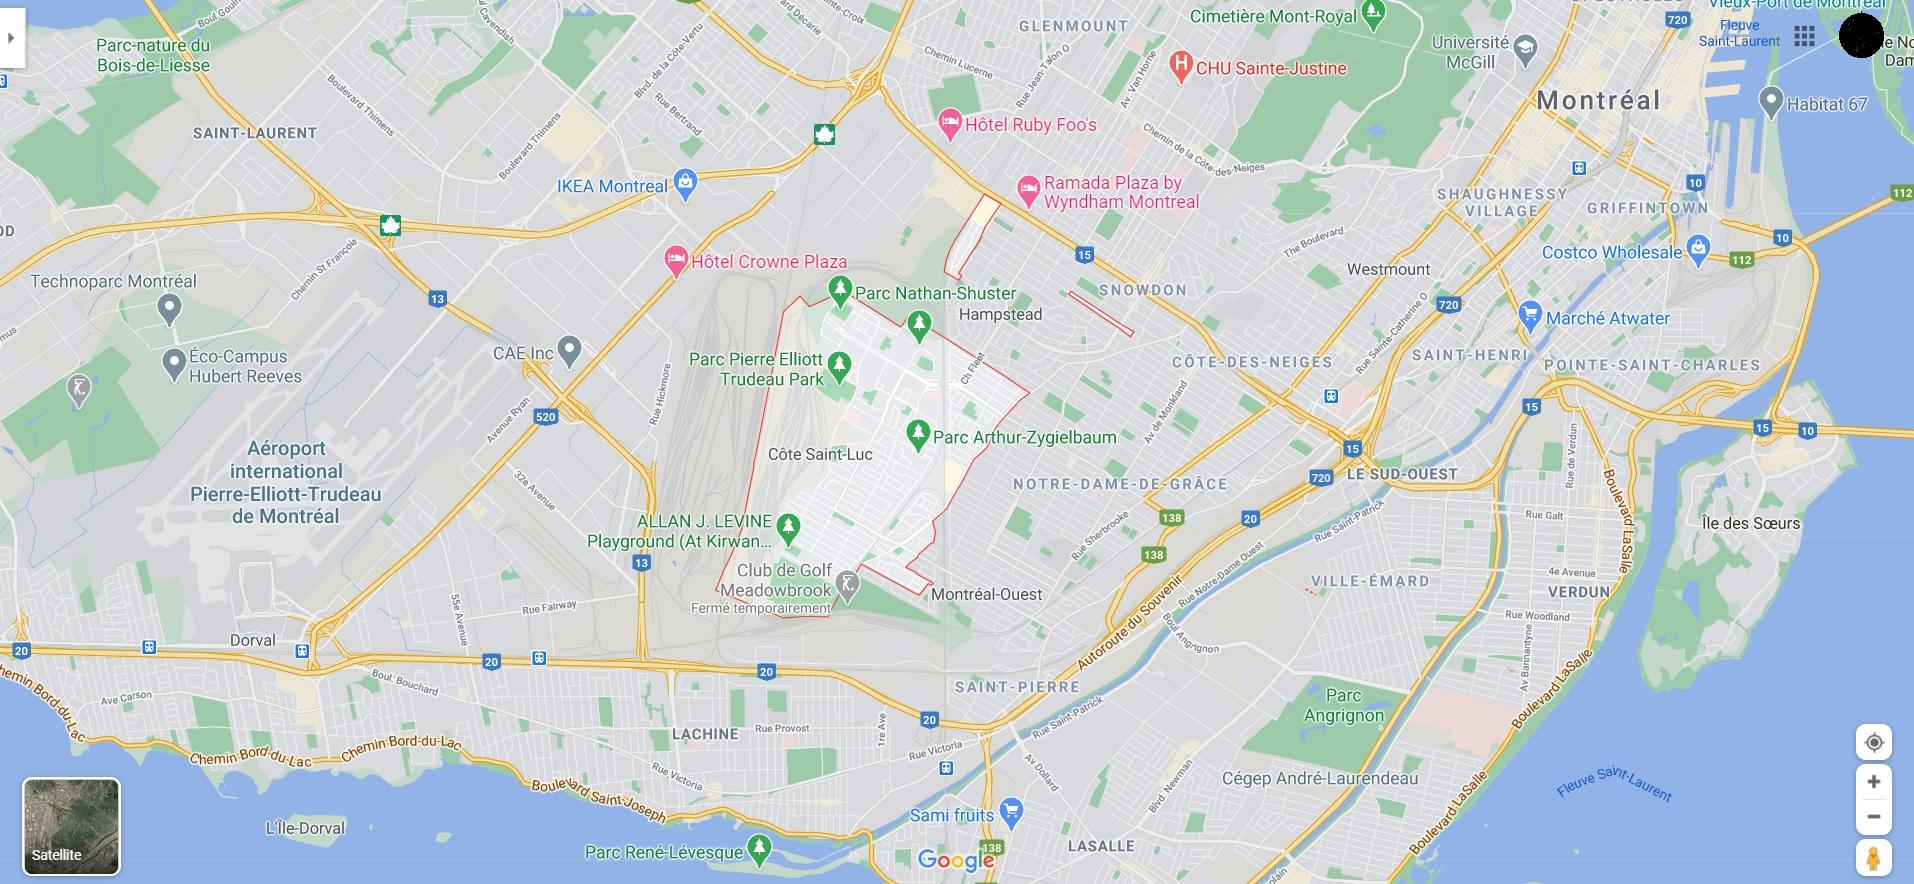 carte cote saint luc montreal